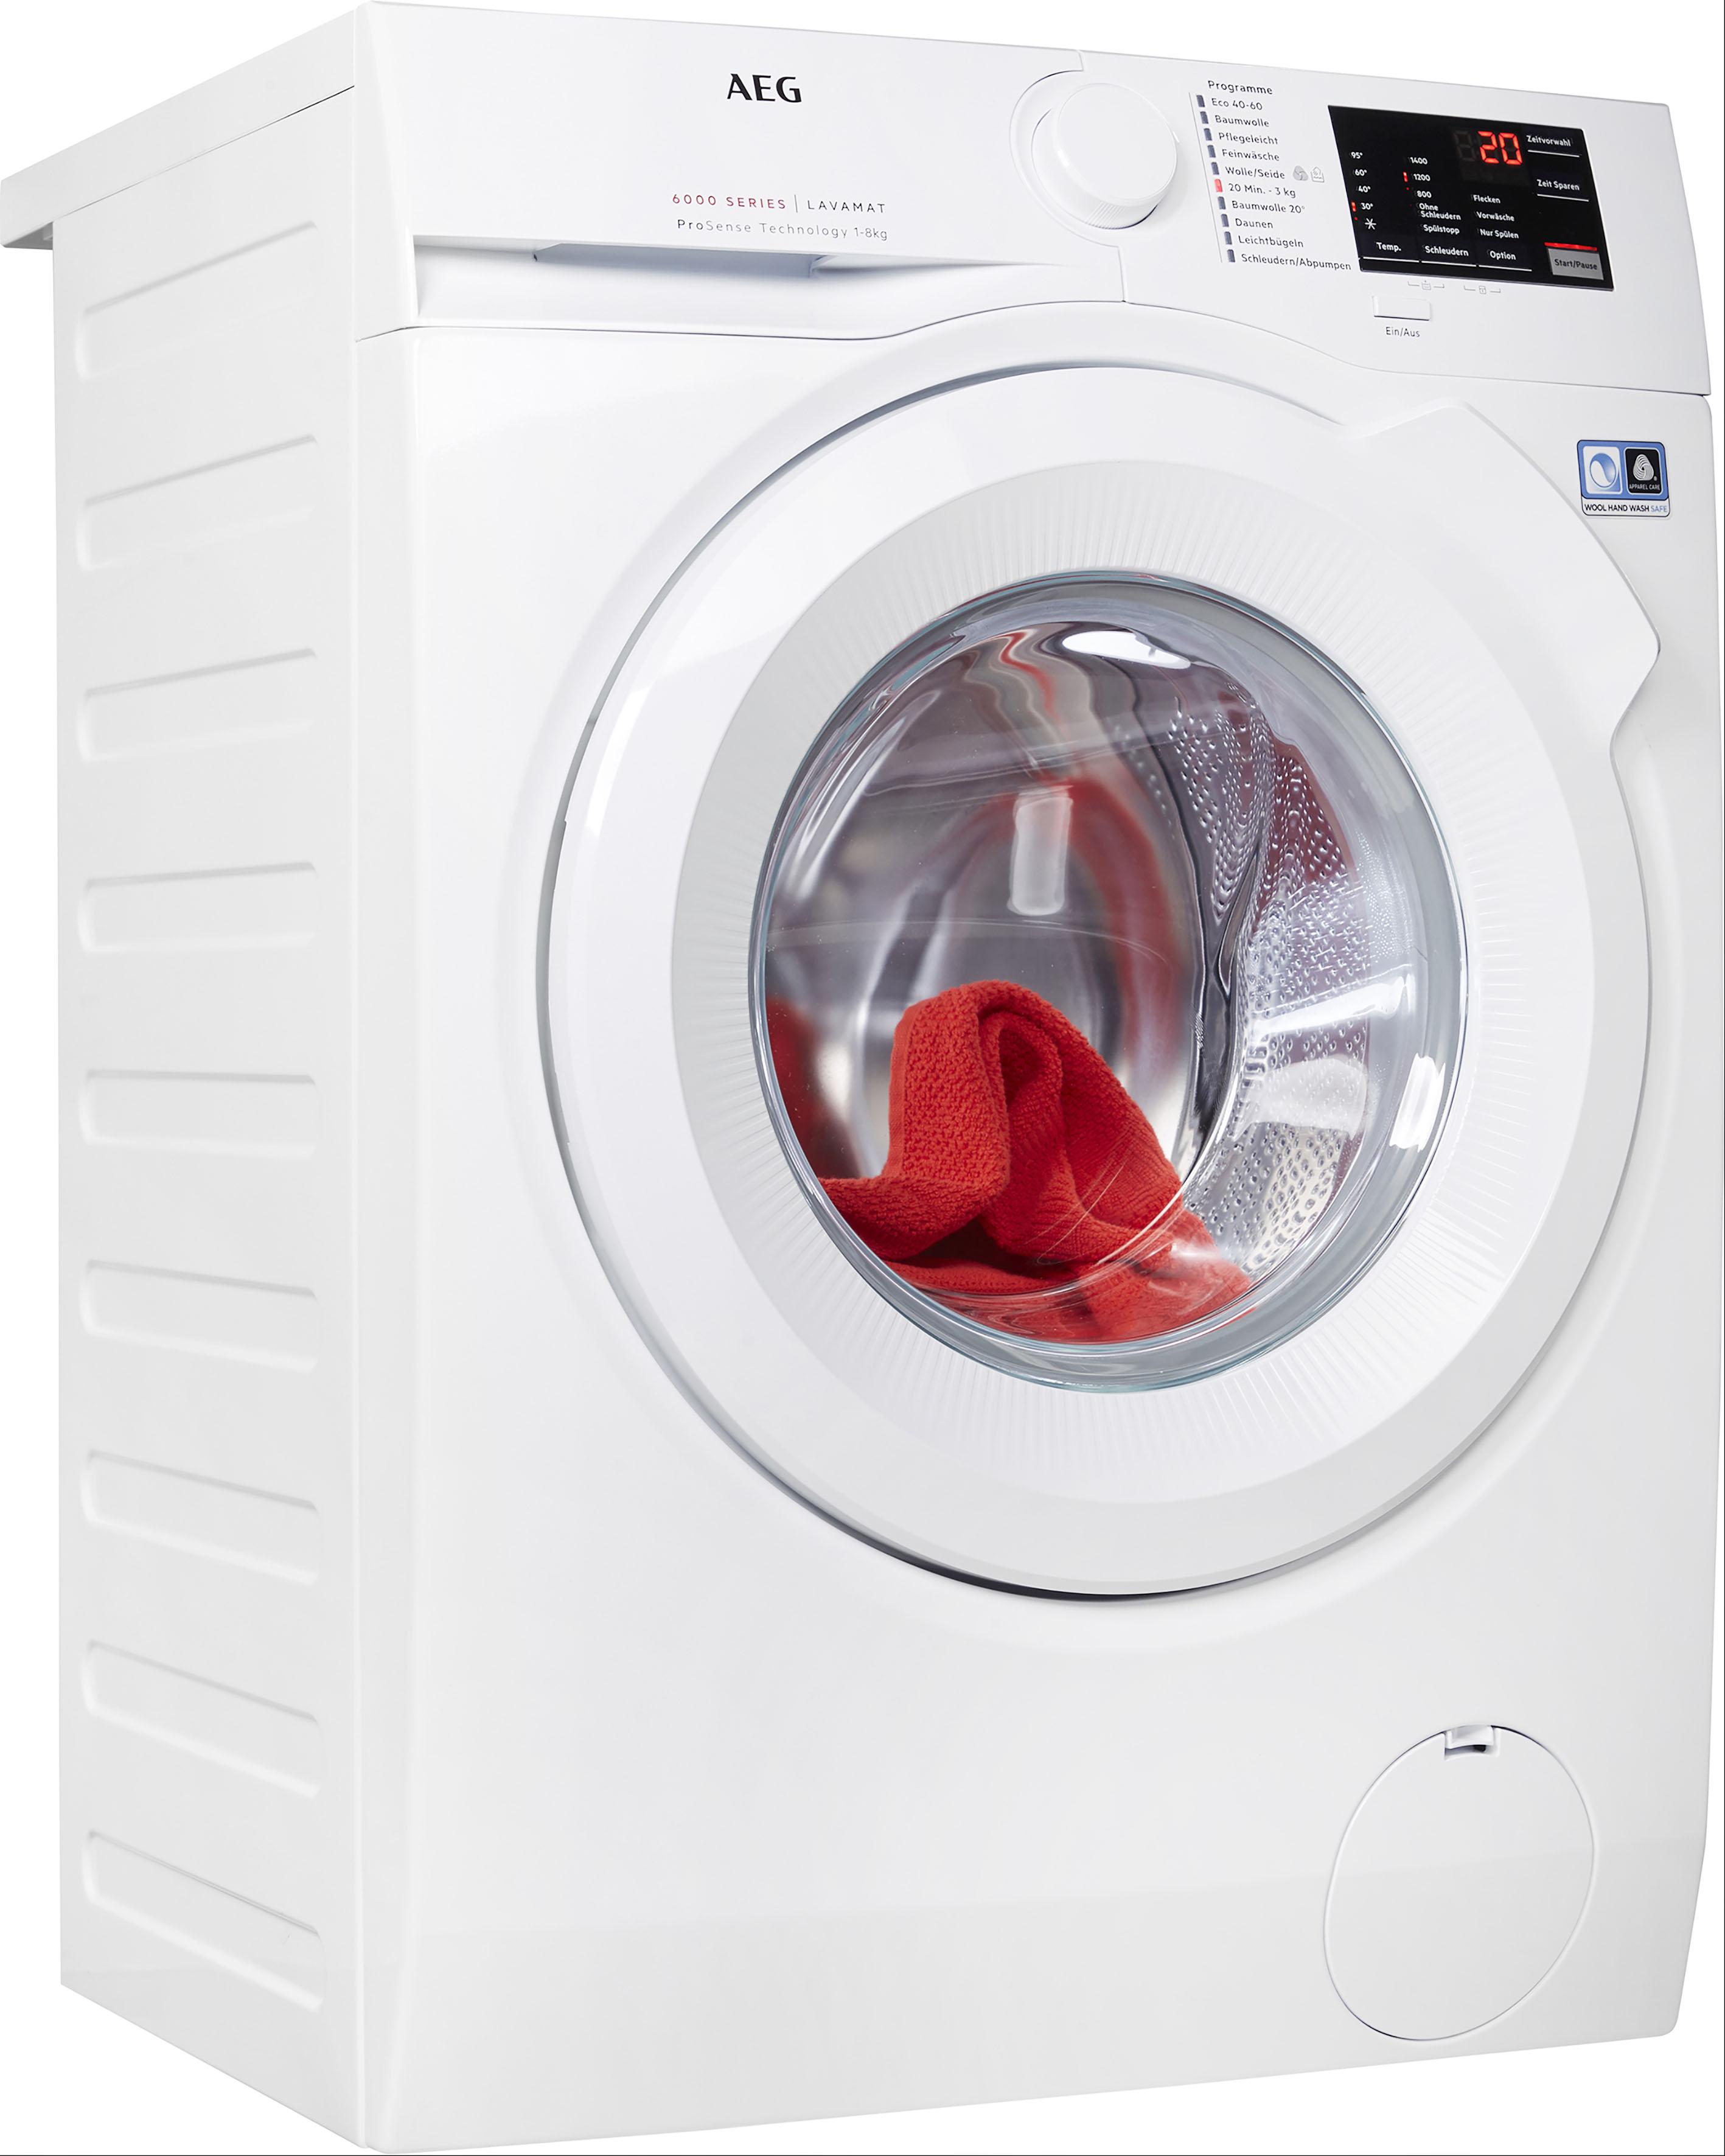 AEG Waschmaschine, L6FBA5480 EEK A+++ weiß Waschmaschinen Haushaltsgeräte Waschmaschine